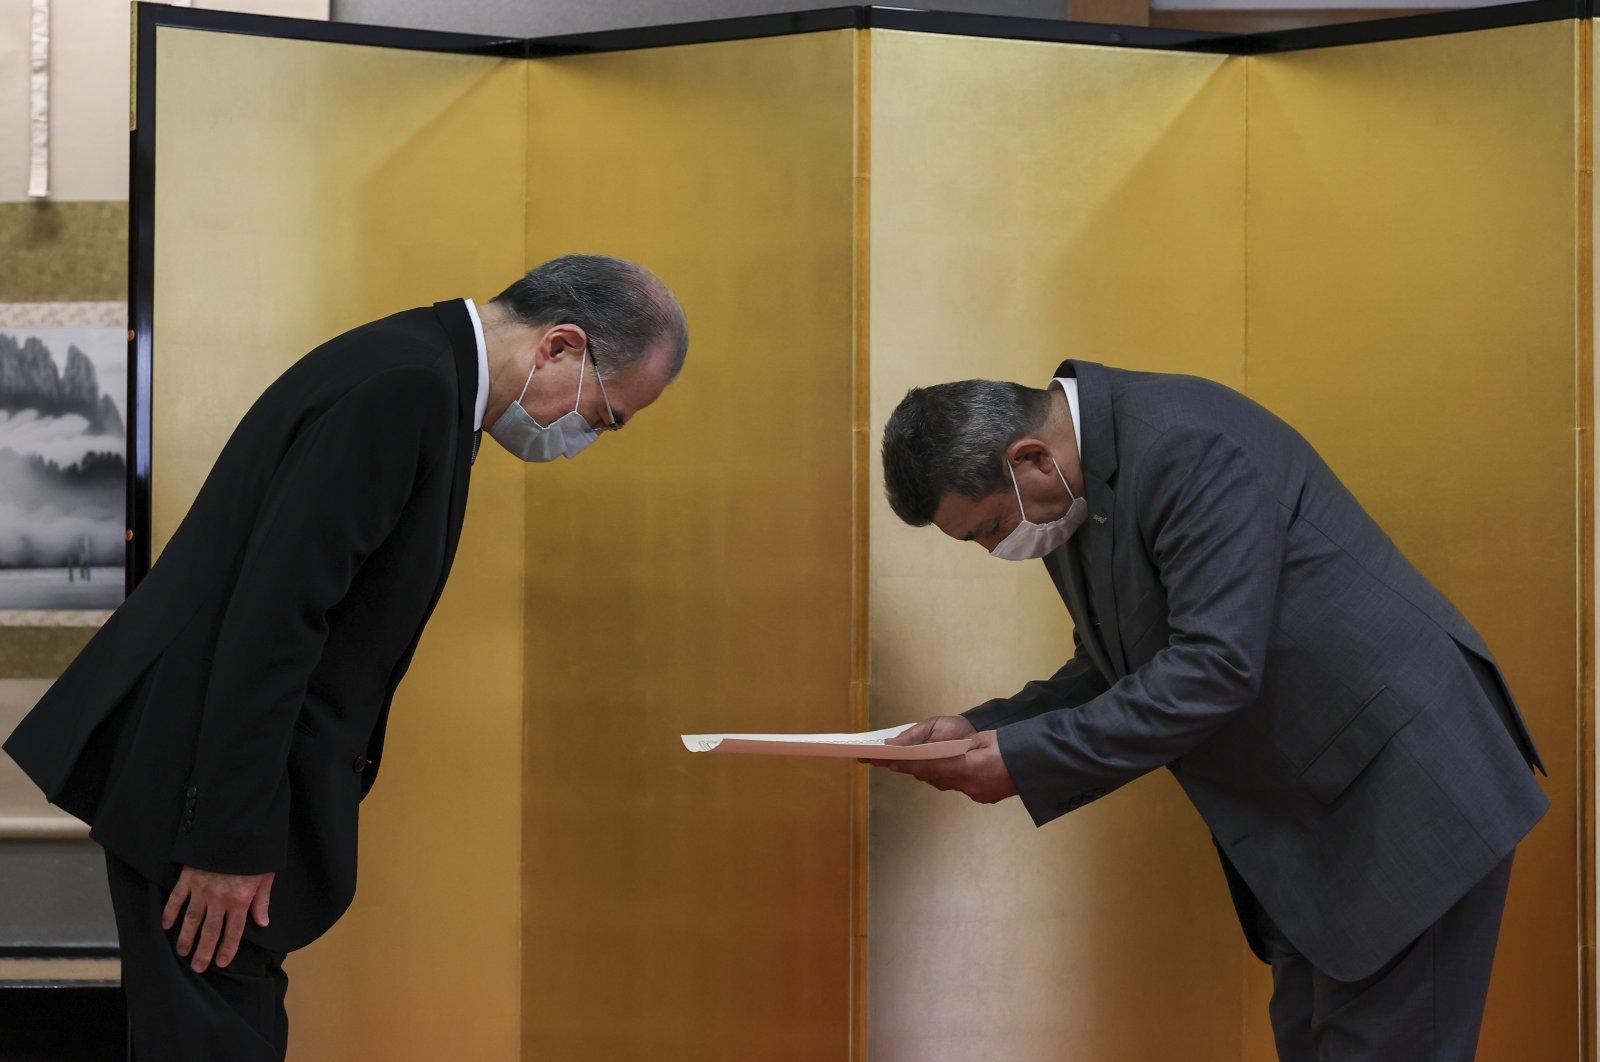 Japanese Ambassador to Turkey Kazuhiro Suzuki (L) and AFAD Bursa province head Yalçın Mumcu (R) bow to each other as the former presents the award, in the capital Ankara, Turkey. (AA Photo)